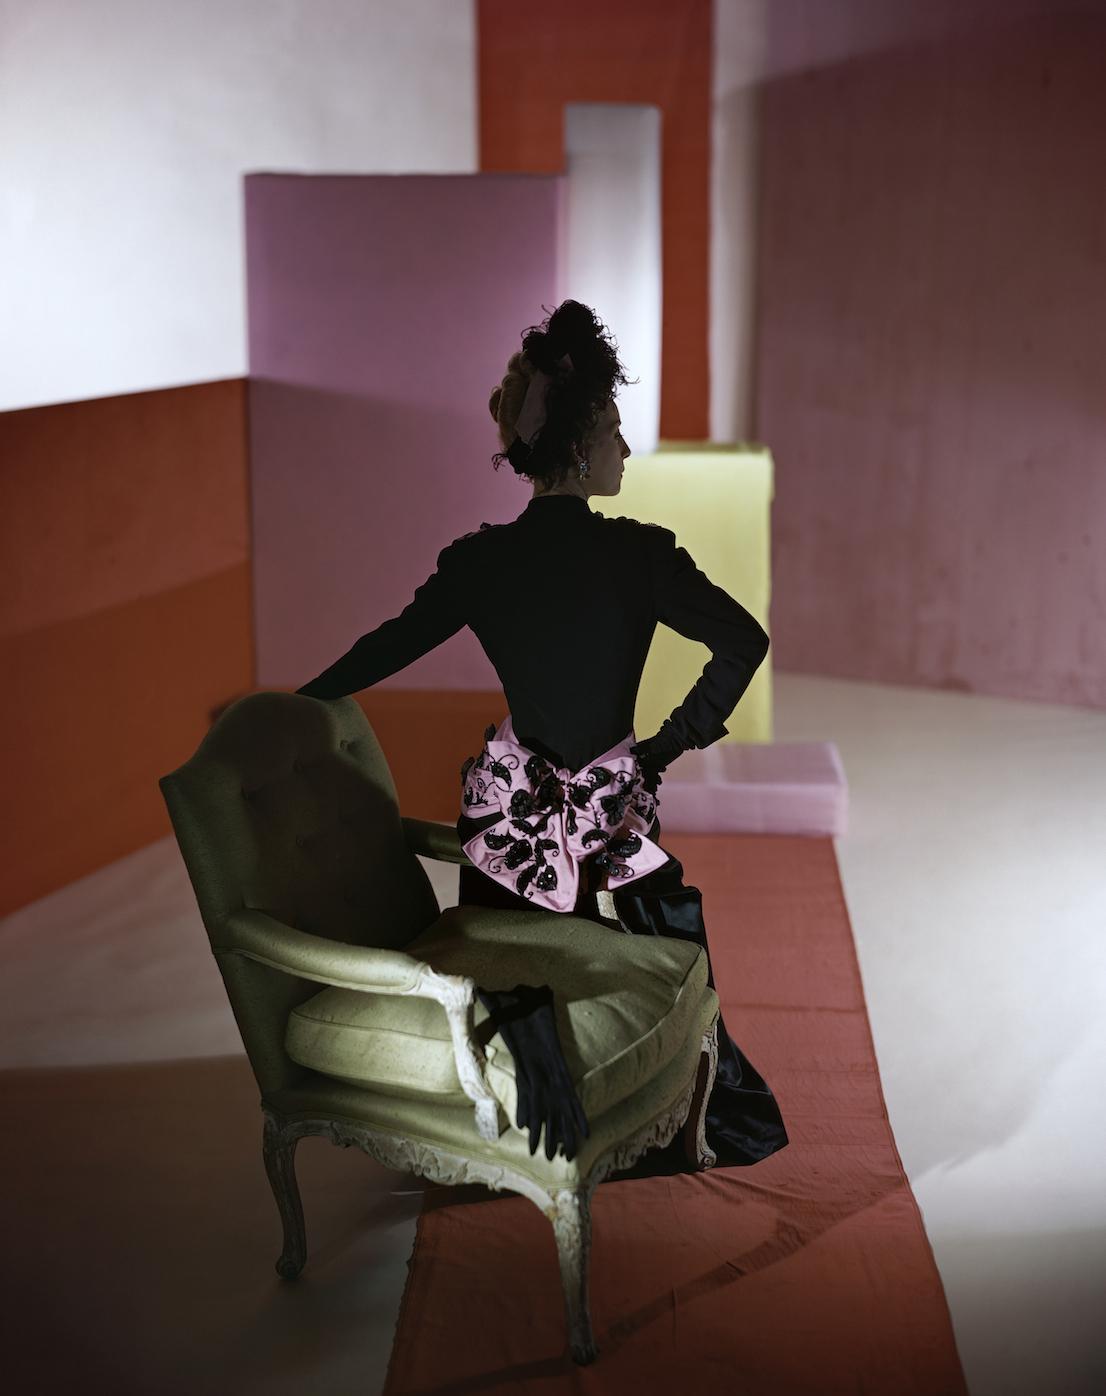 Dinner suit and headdress by Schiaparelli, 1947. © Condé Nast / Horst Estate.